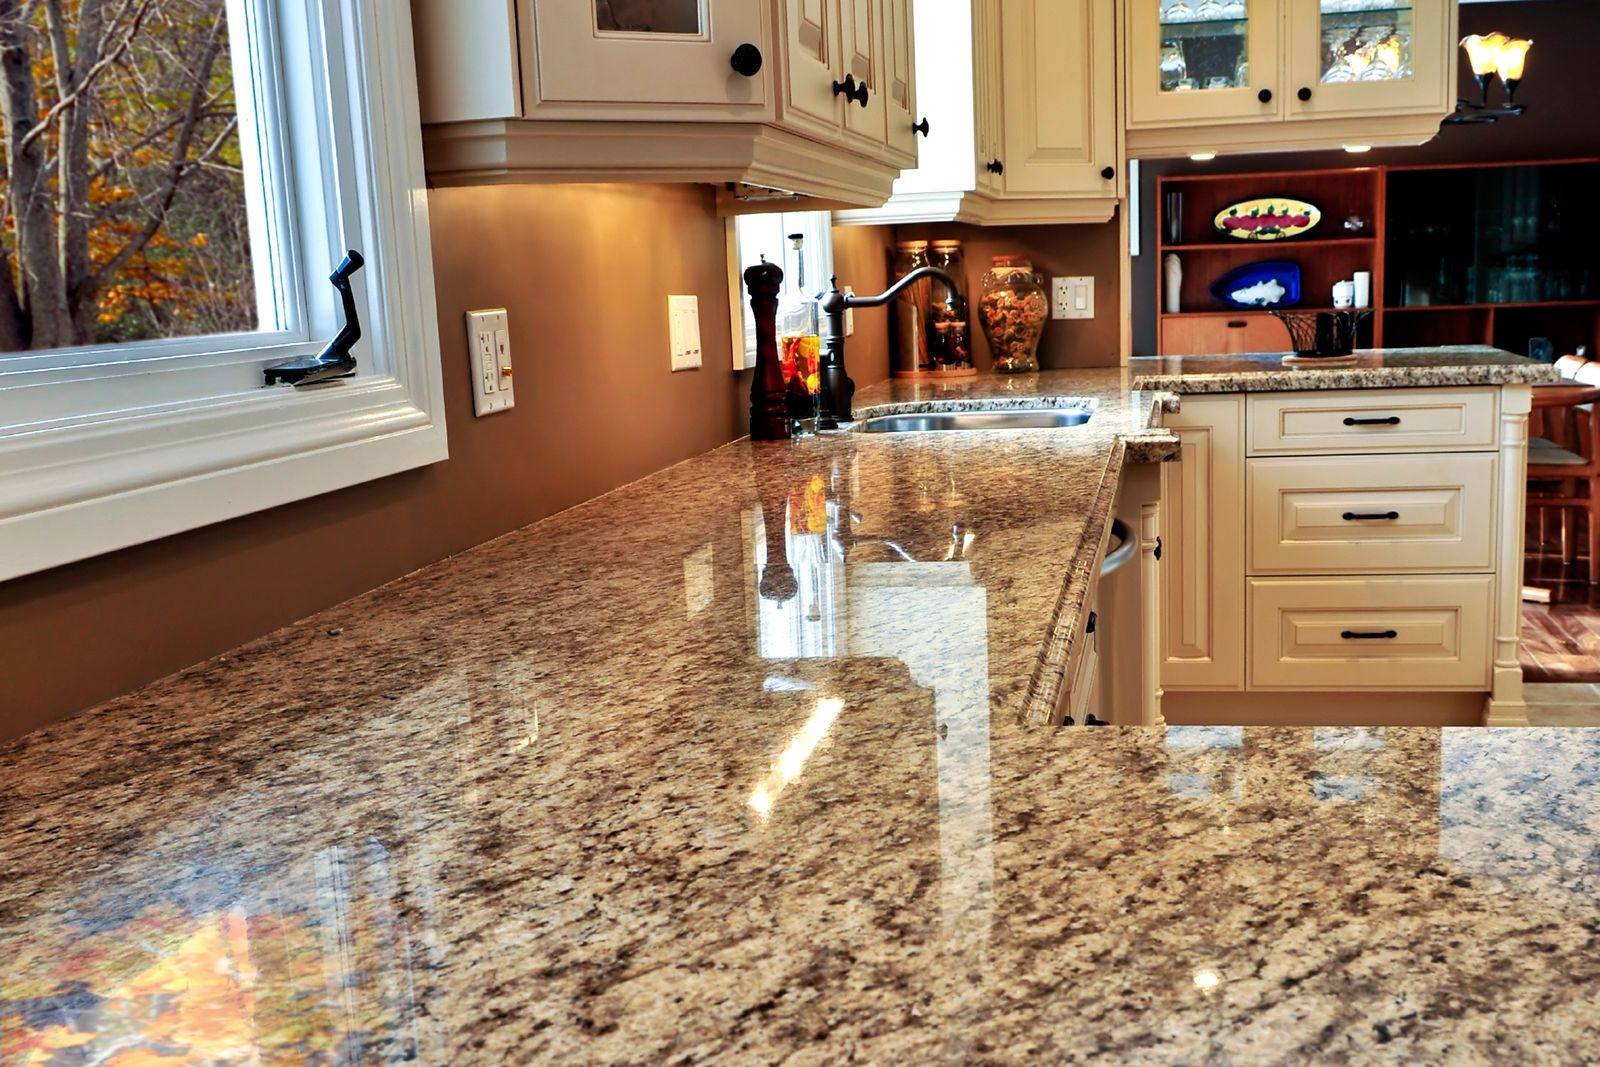 Laminate kitchen countertops that look like granite